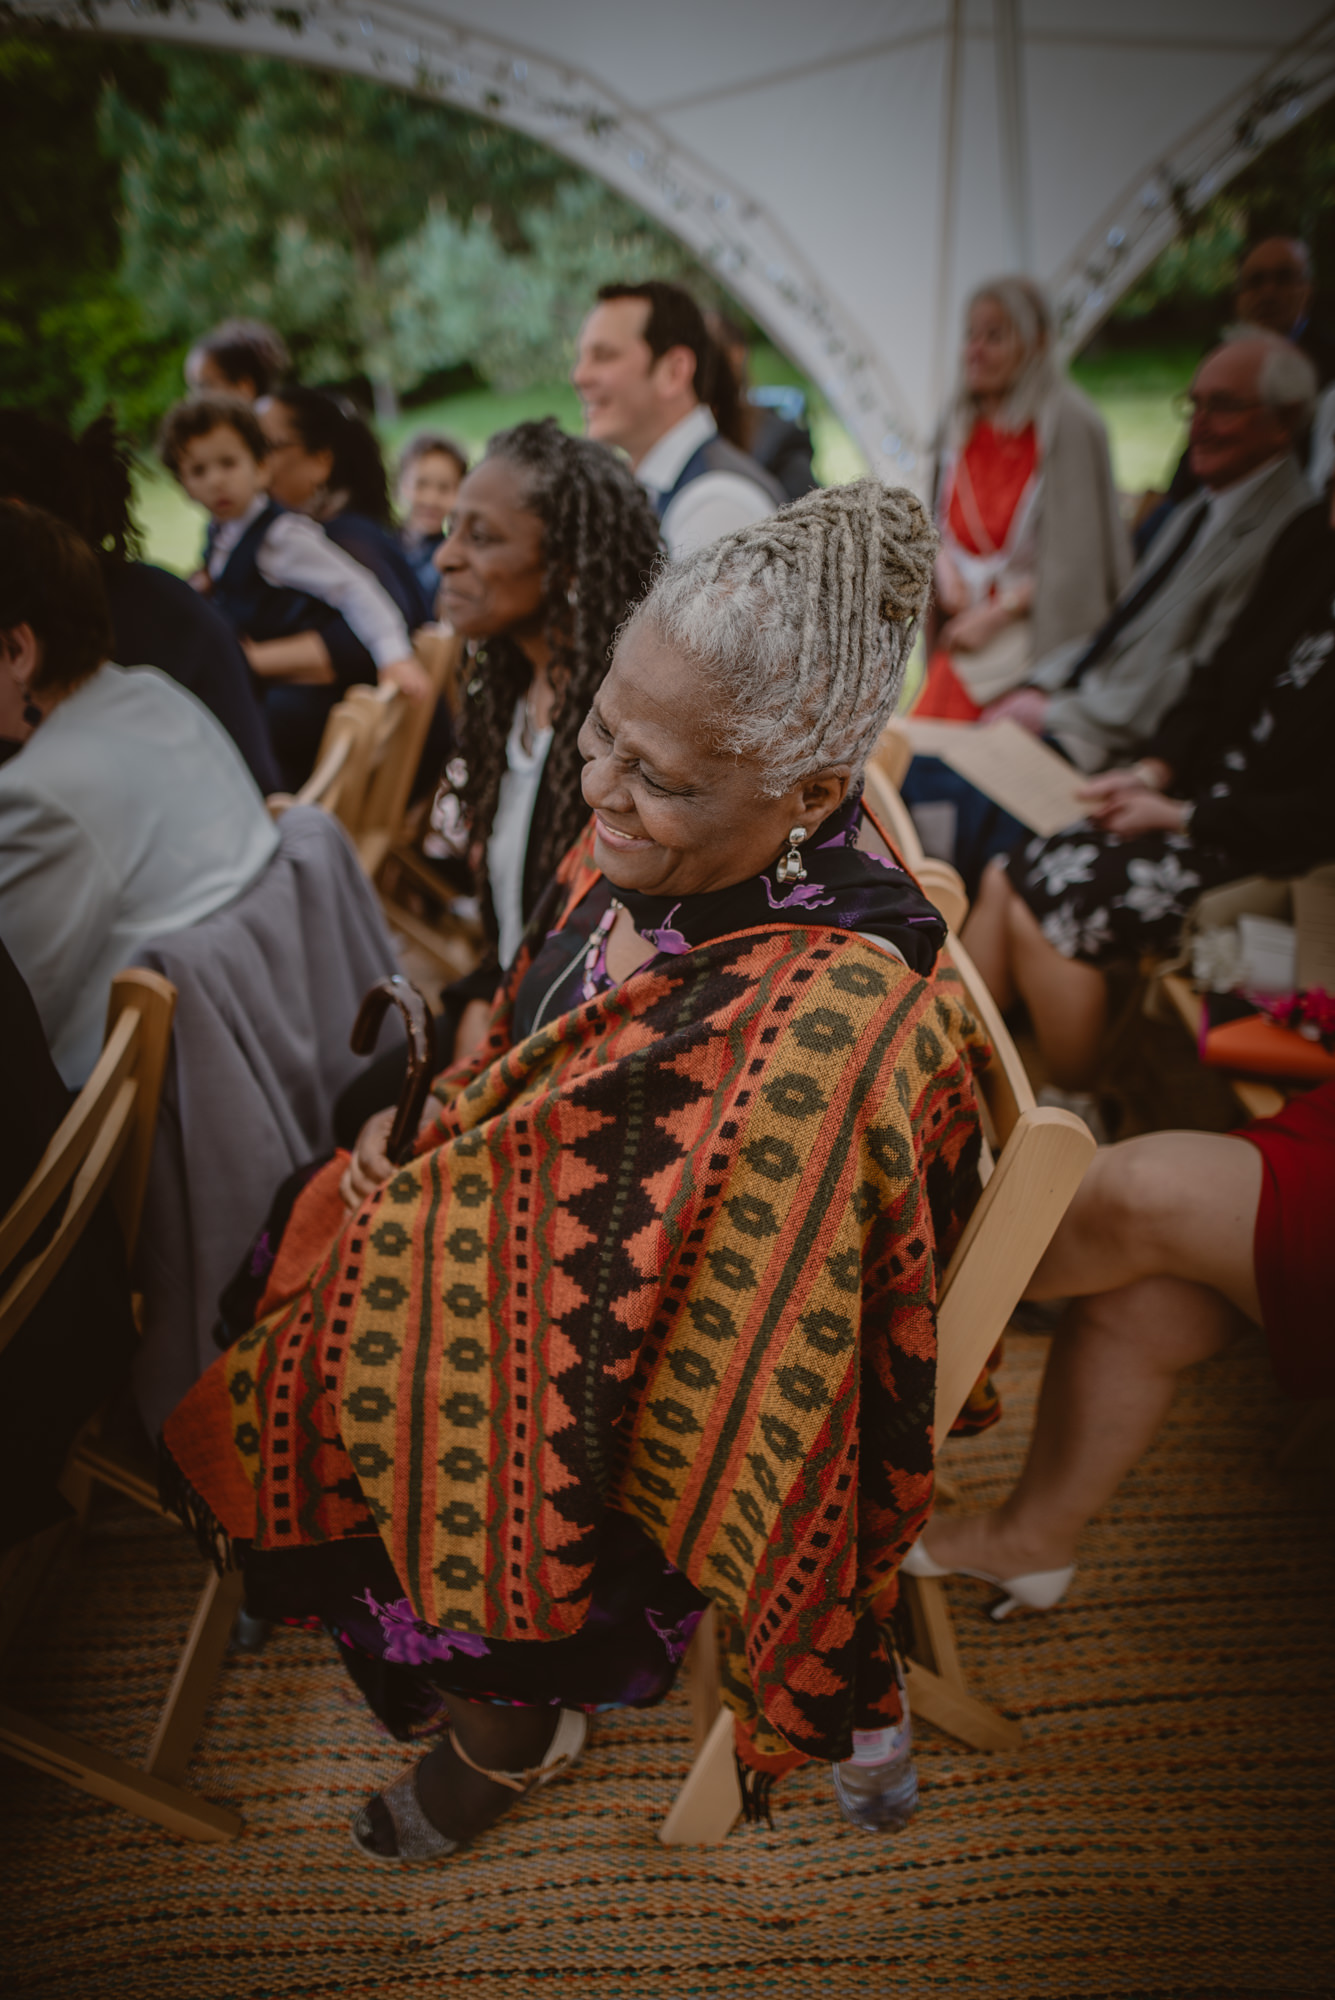 Jacqueline-Gareth-Wedding-Westmead-Events-Surrey-Manu-Mendoza-Wedding-Photography-242.jpg